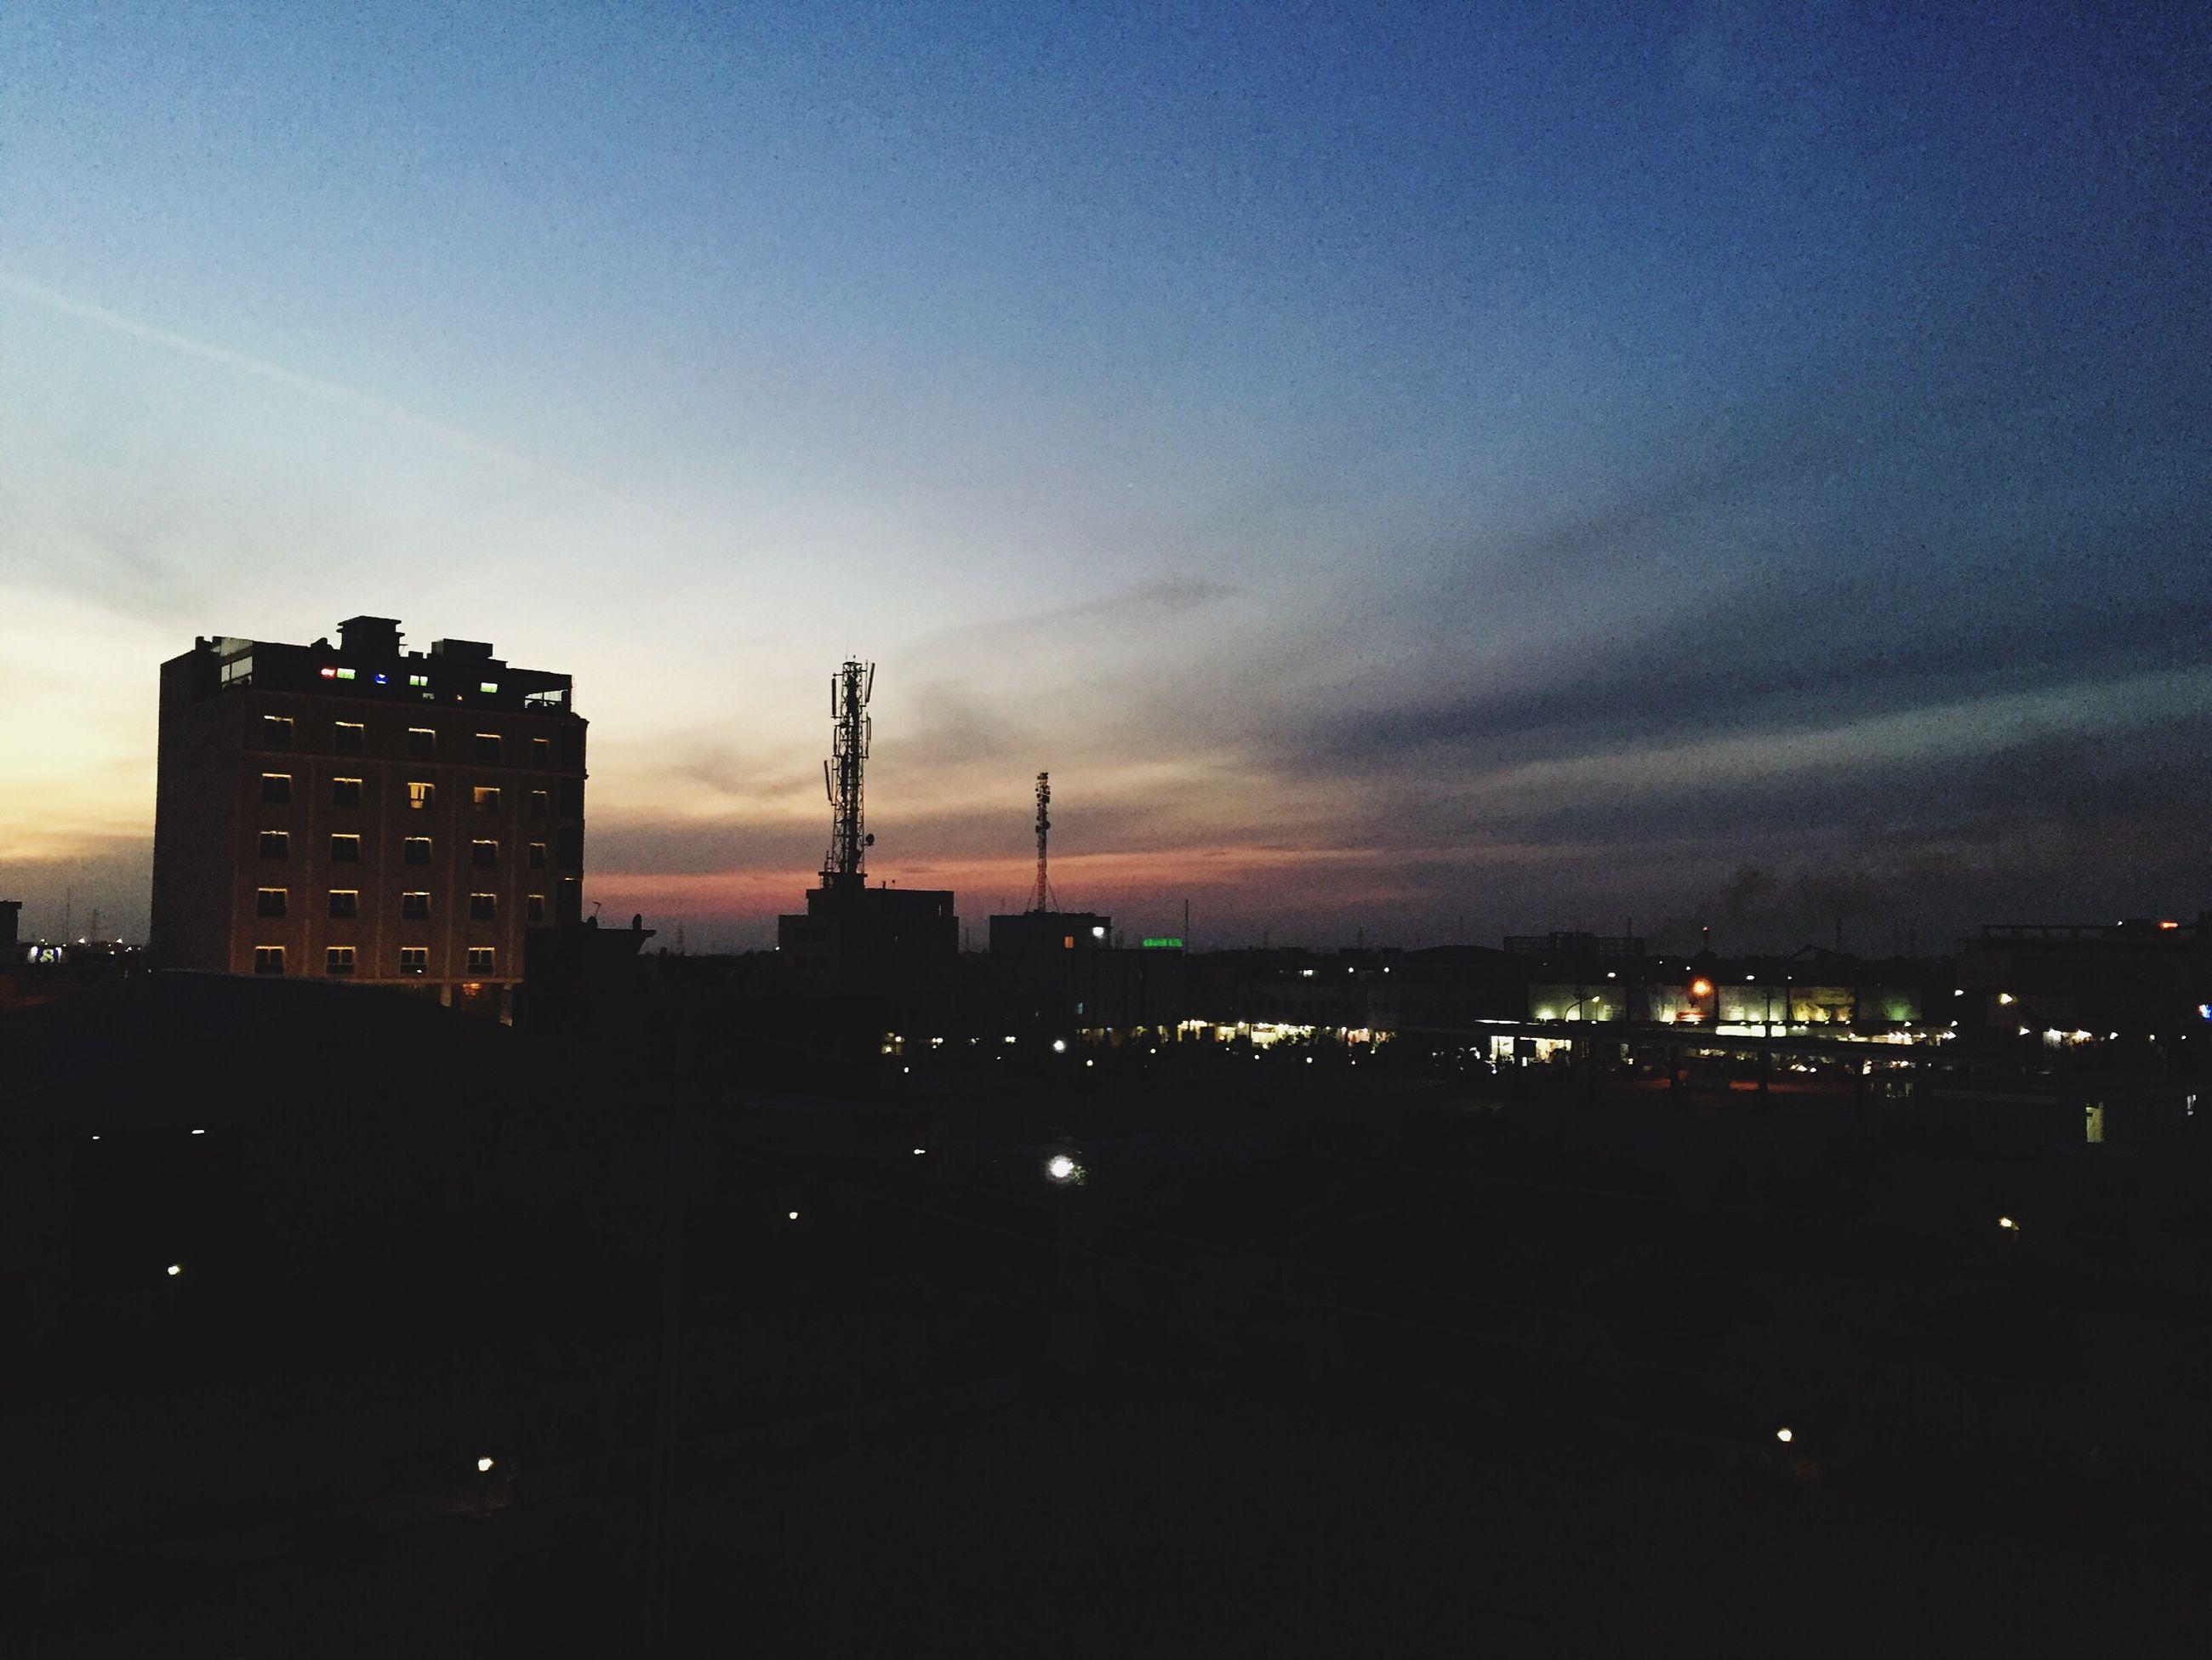 building exterior, architecture, built structure, silhouette, sky, city, illuminated, dusk, sunset, night, dark, cloud - sky, cityscape, building, copy space, outdoors, development, no people, residential building, cloud